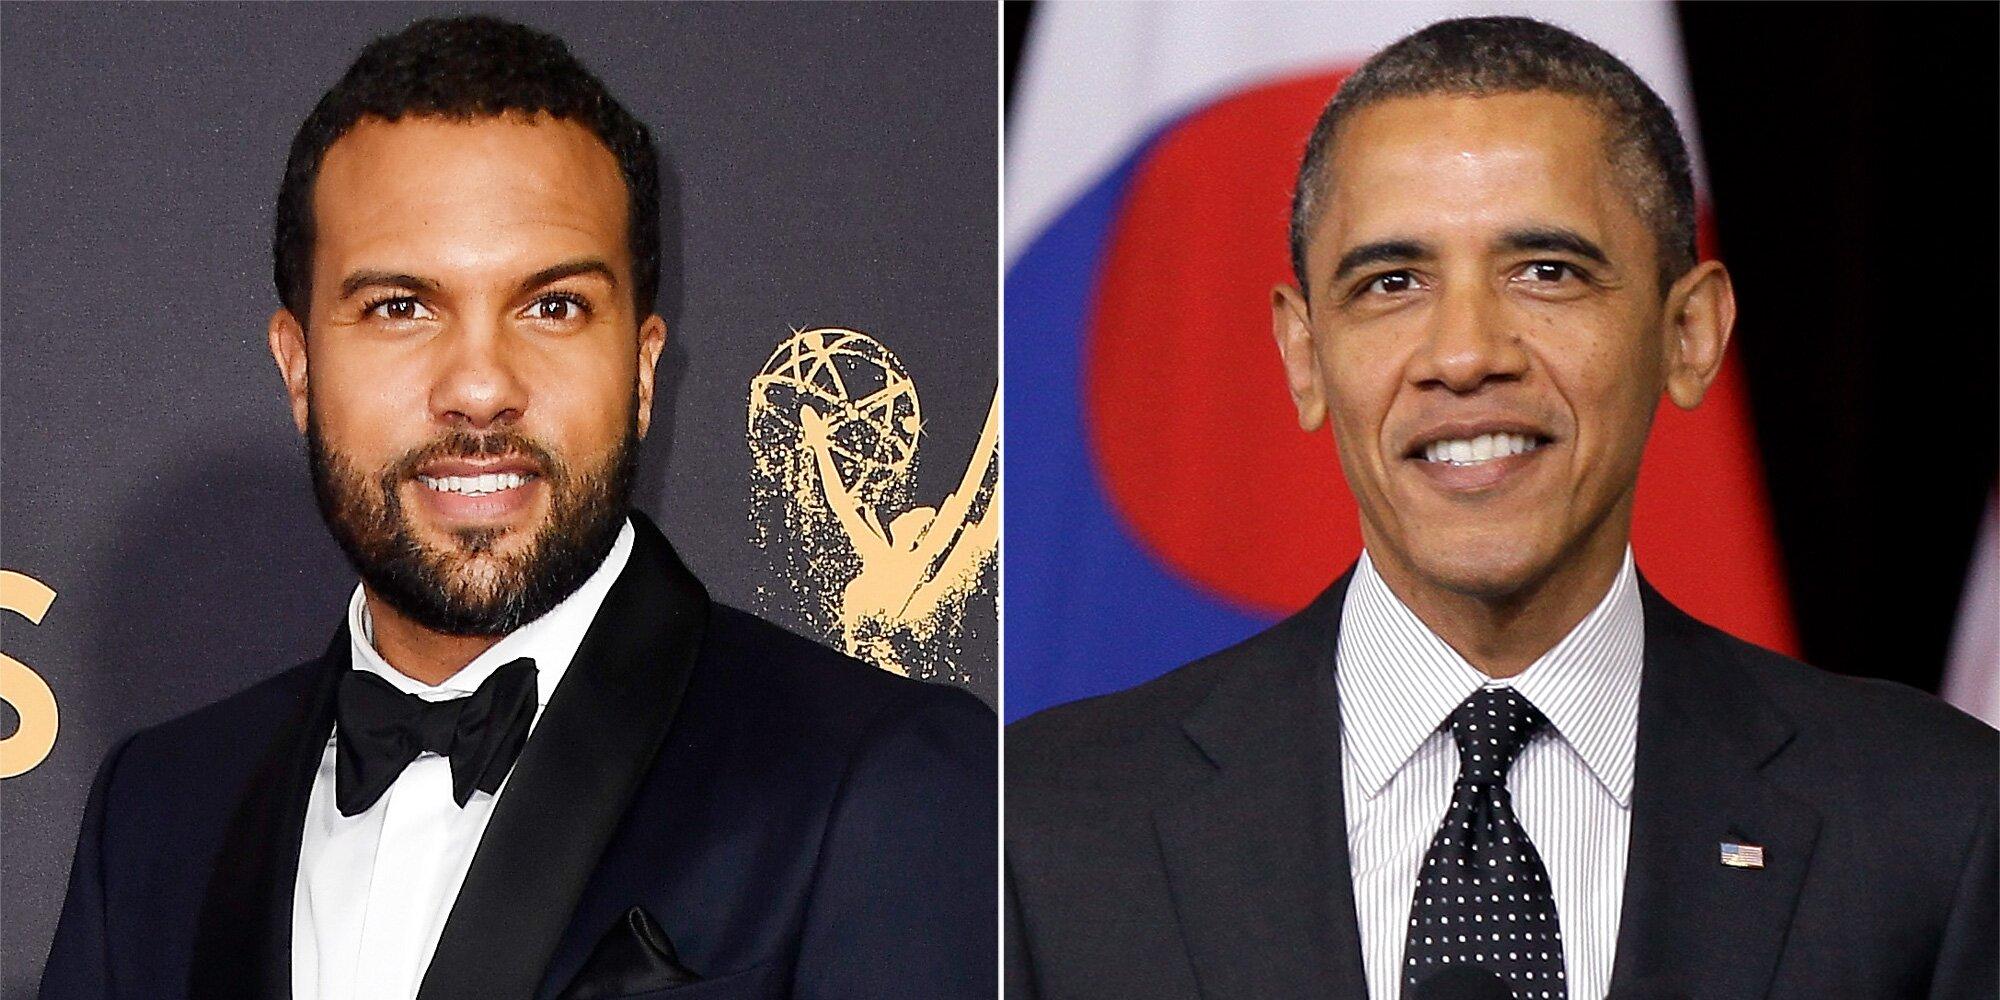 <em>The Handmaid's Tale</em> star O-T Fagbenle cast as Barack Obama in Showtime's <em>The First Lady</em>